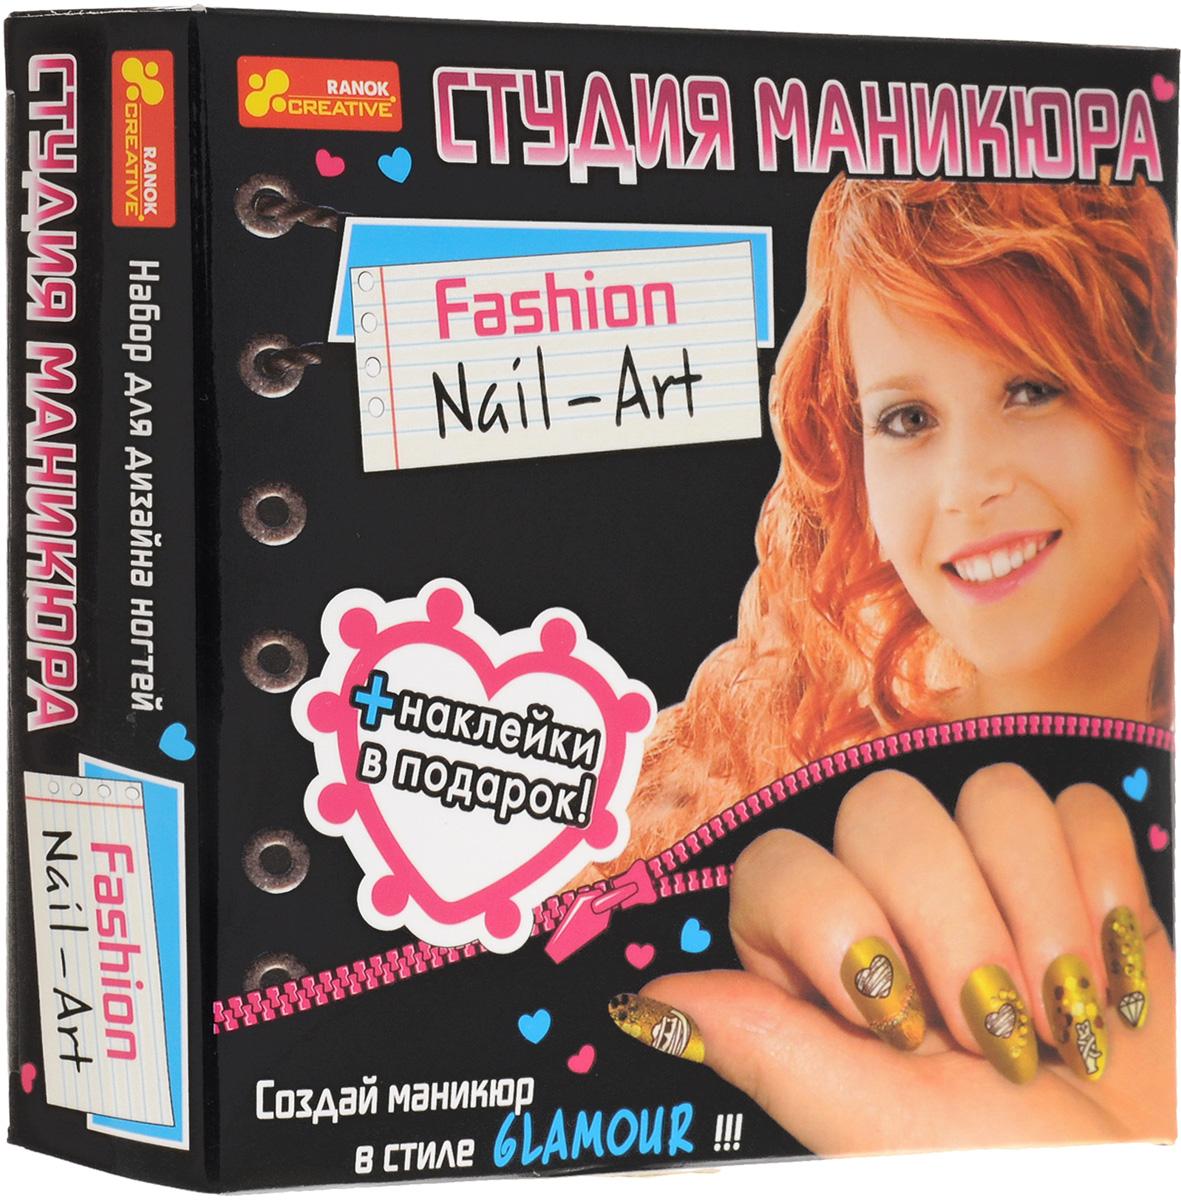 Ranok Набор для нейл-арта Студия маникюра Glamour набор для маникюра ранок шикарные ноготки